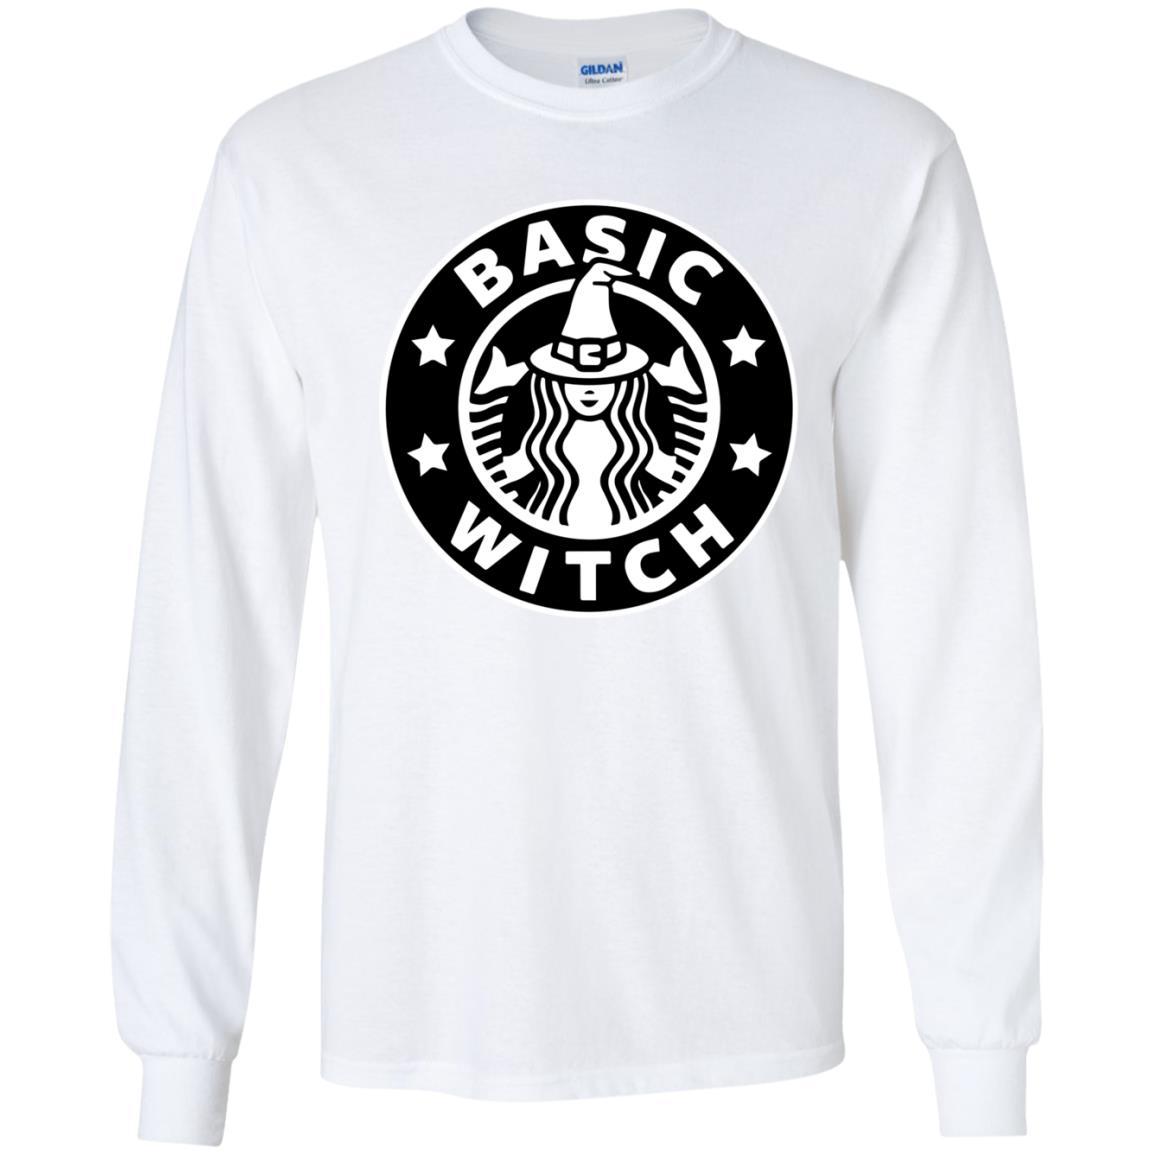 image 1017 - Basic Witch Shirt, Halloween Starbuck parody